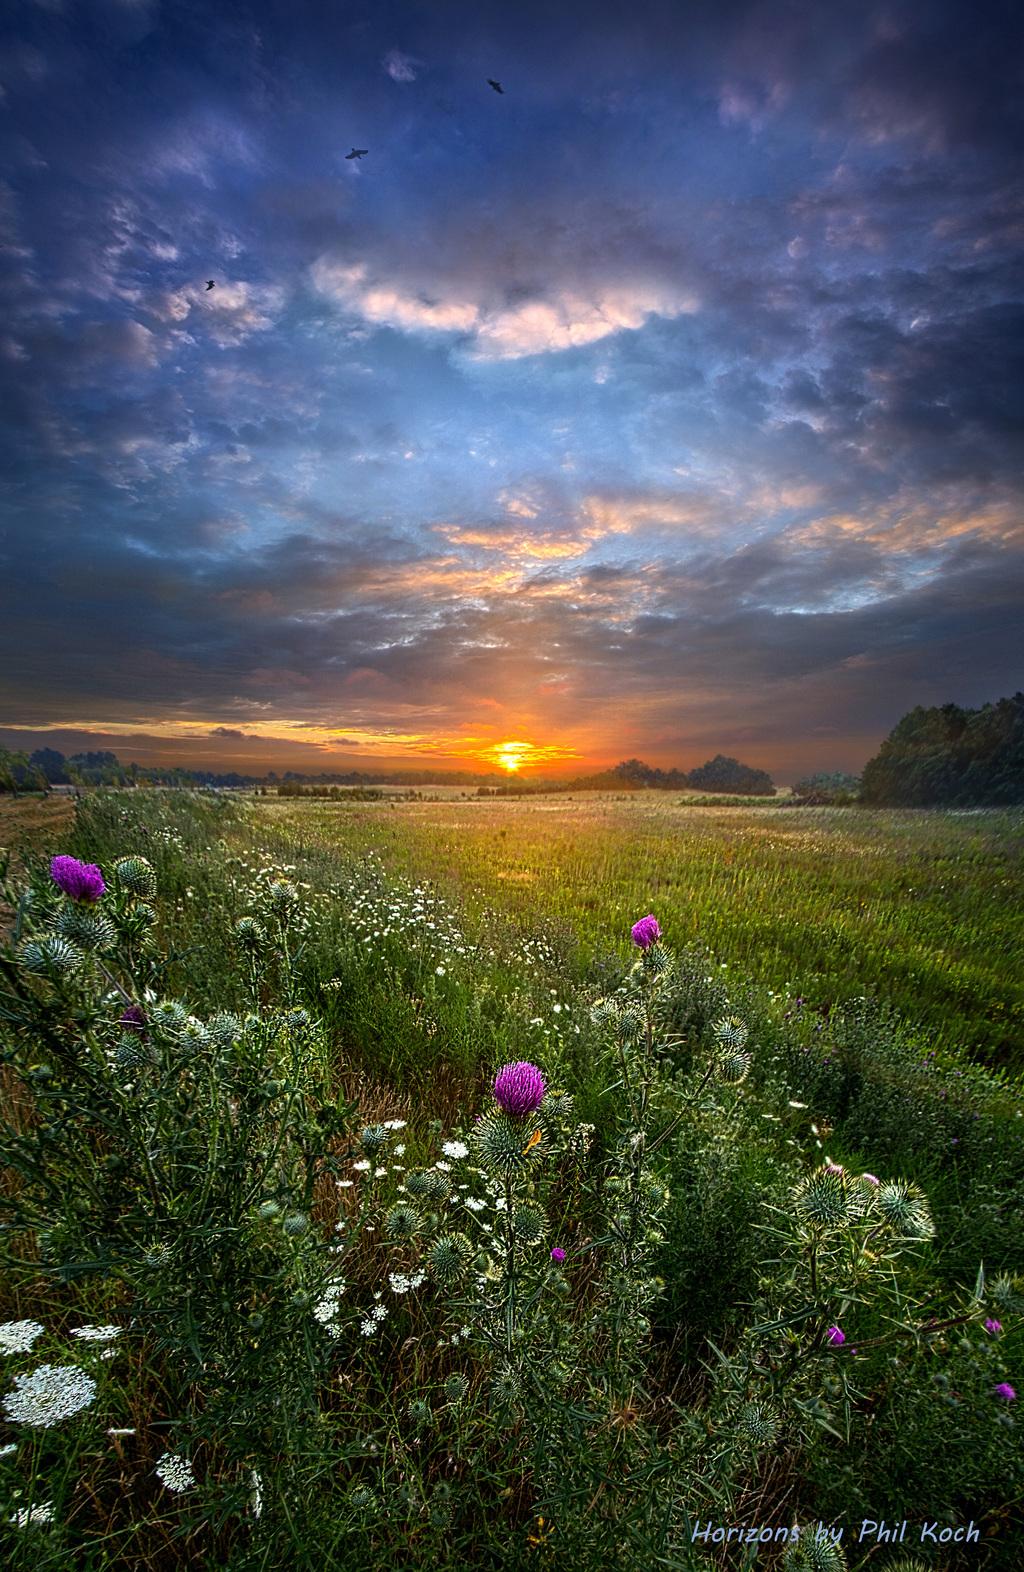 Wisconsin Horizons by Phil Koch                                         Turning natural landscapes i... via Phil Koch